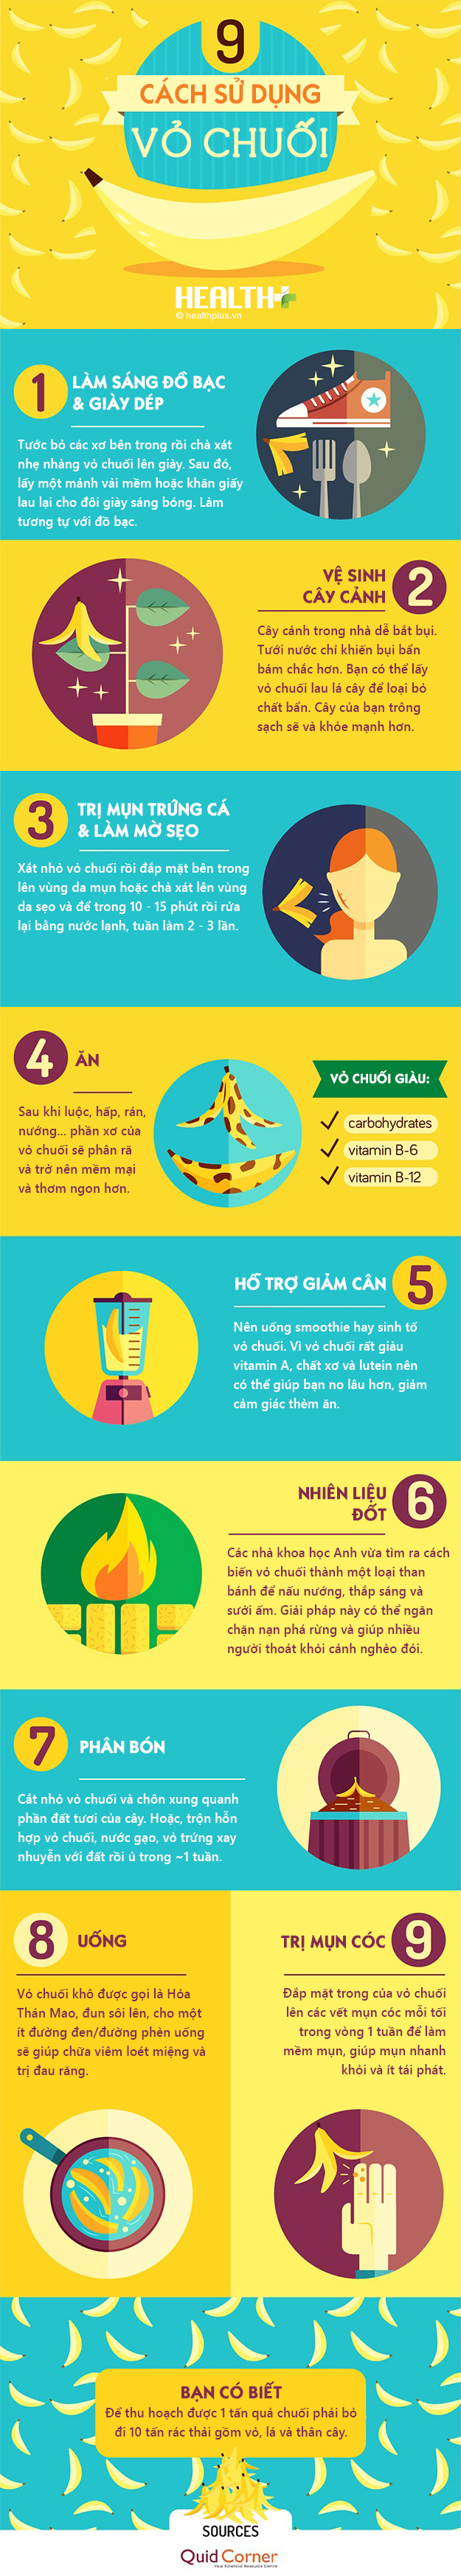 9 cach su dung vo chuoi